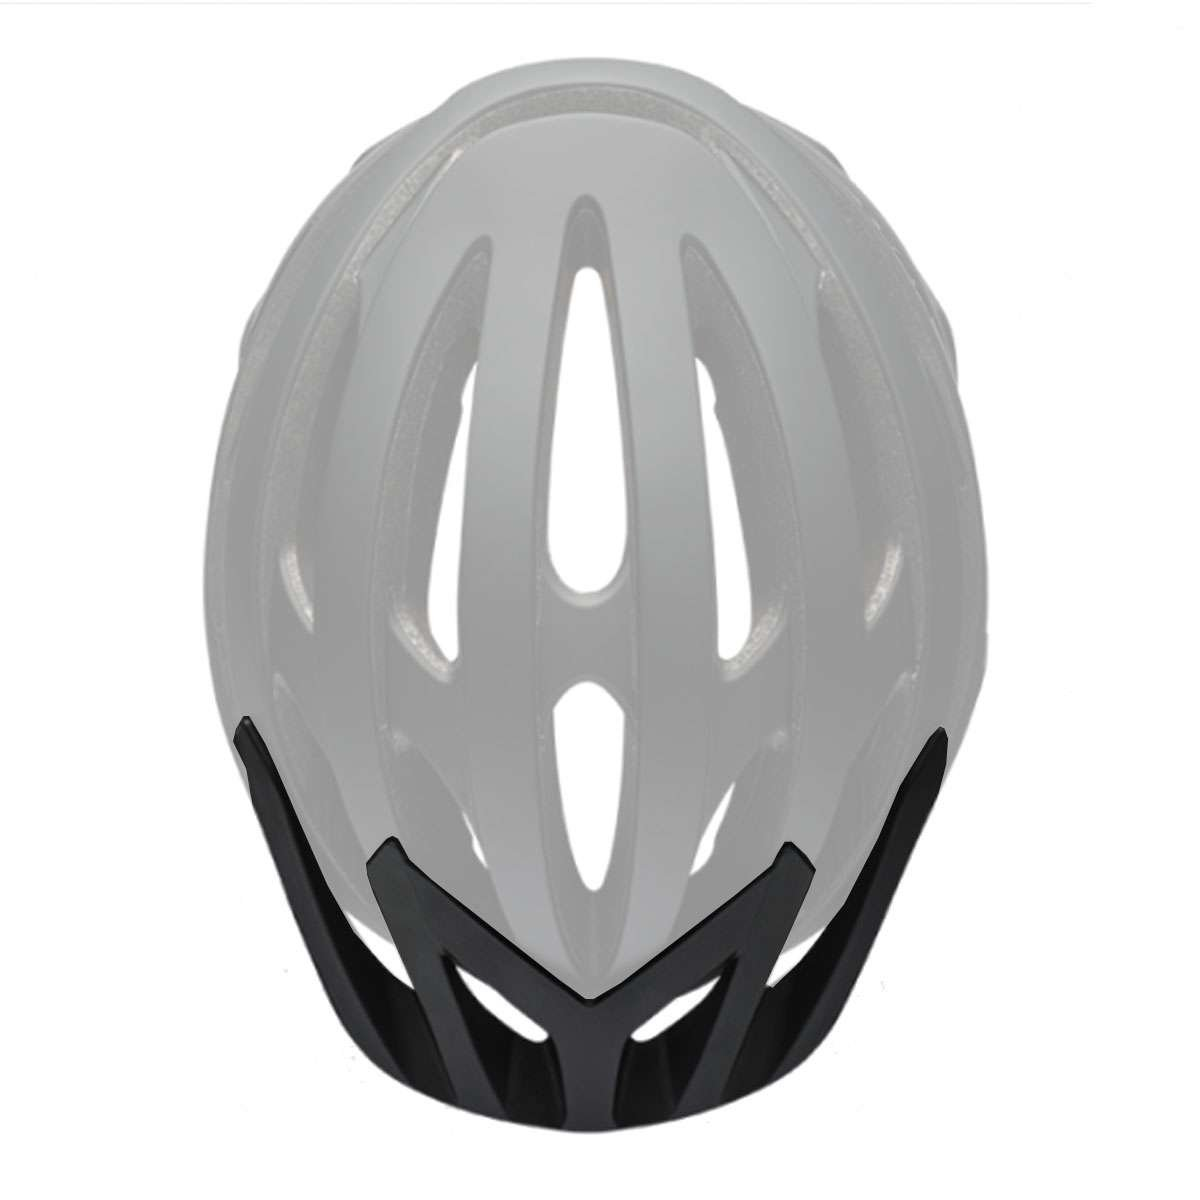 Bell Sports Catalyst Helmet - Replacement Visor - Matte Black - 7085310